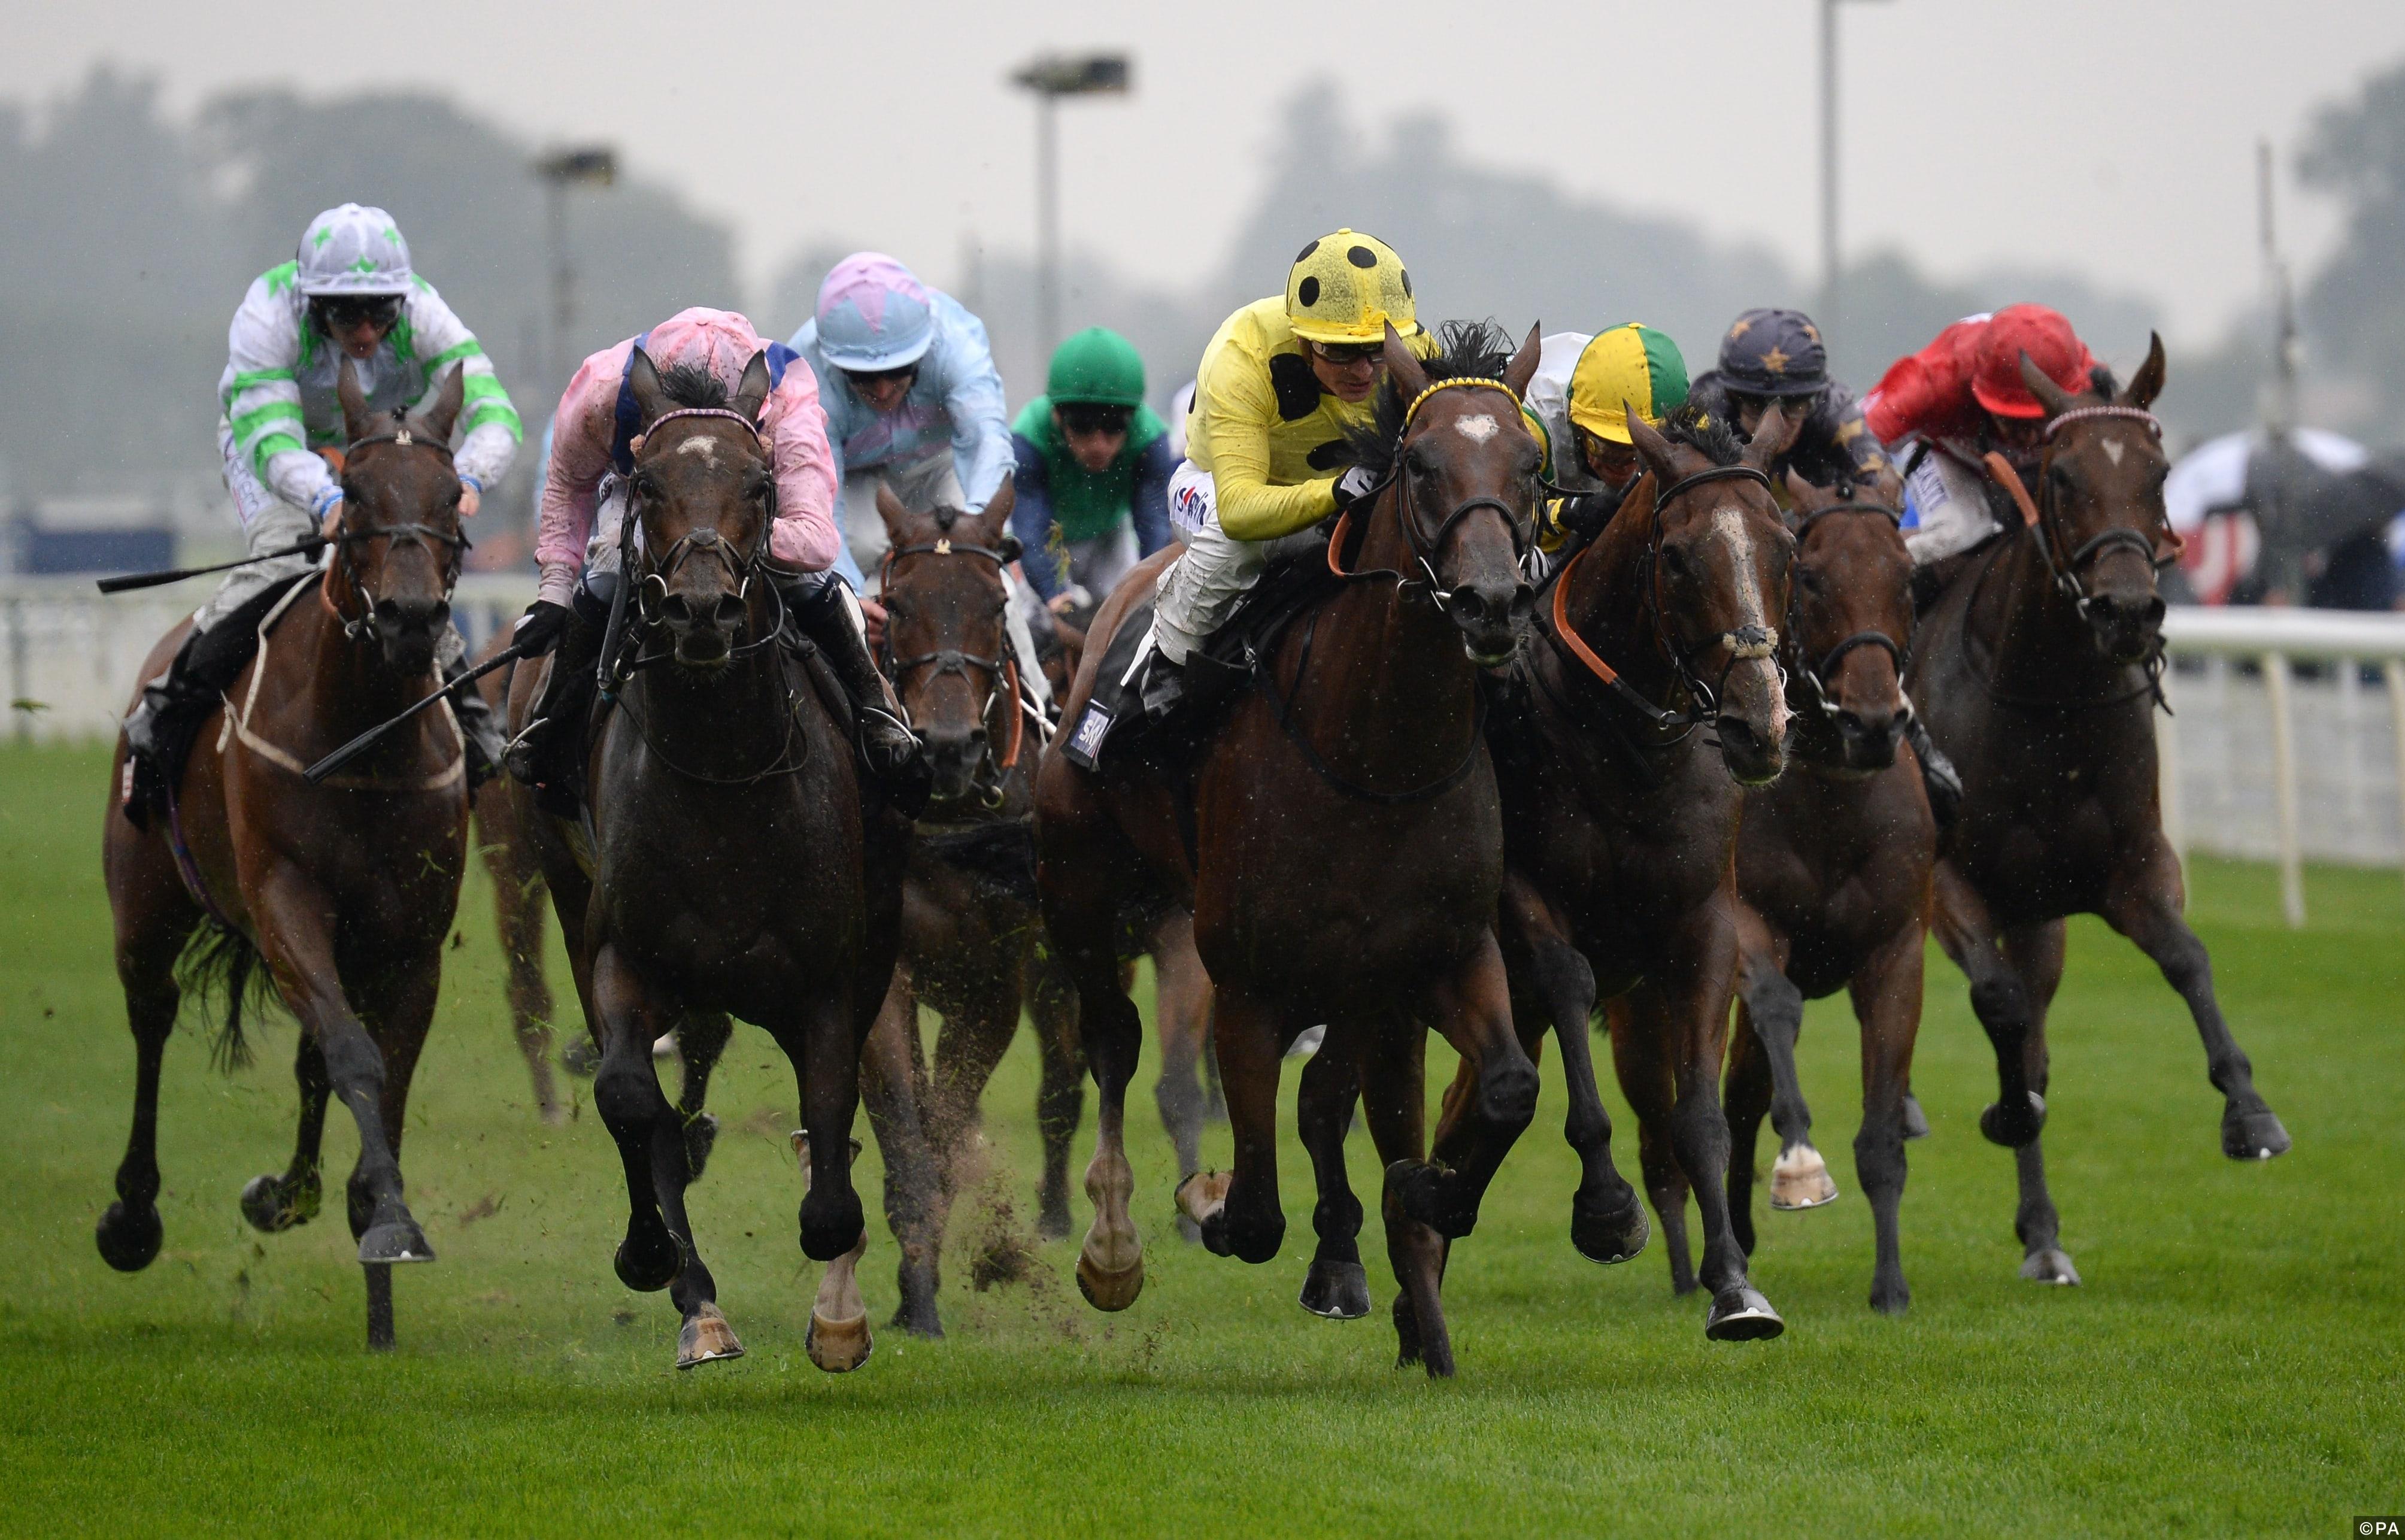 2016 Yorkshire Ebor Festival - Coolmore Nunthorpe Day - York Racecourse